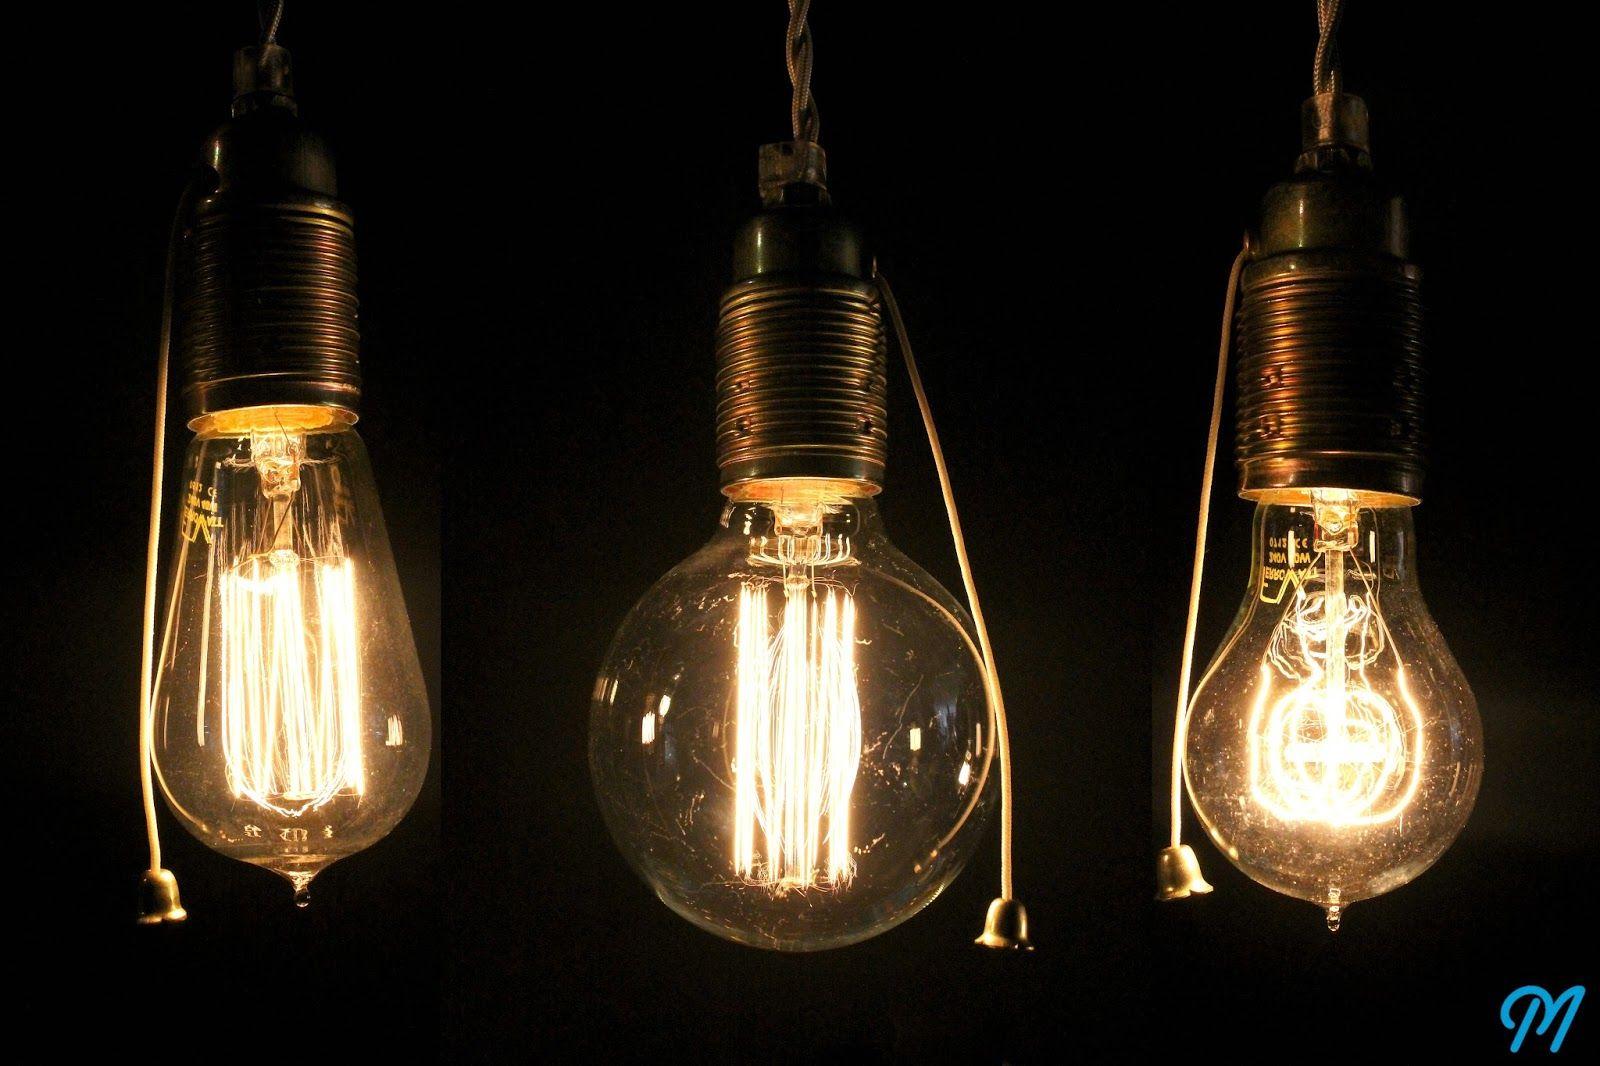 3 ampoules filament culot m tal laiton projet pub o. Black Bedroom Furniture Sets. Home Design Ideas